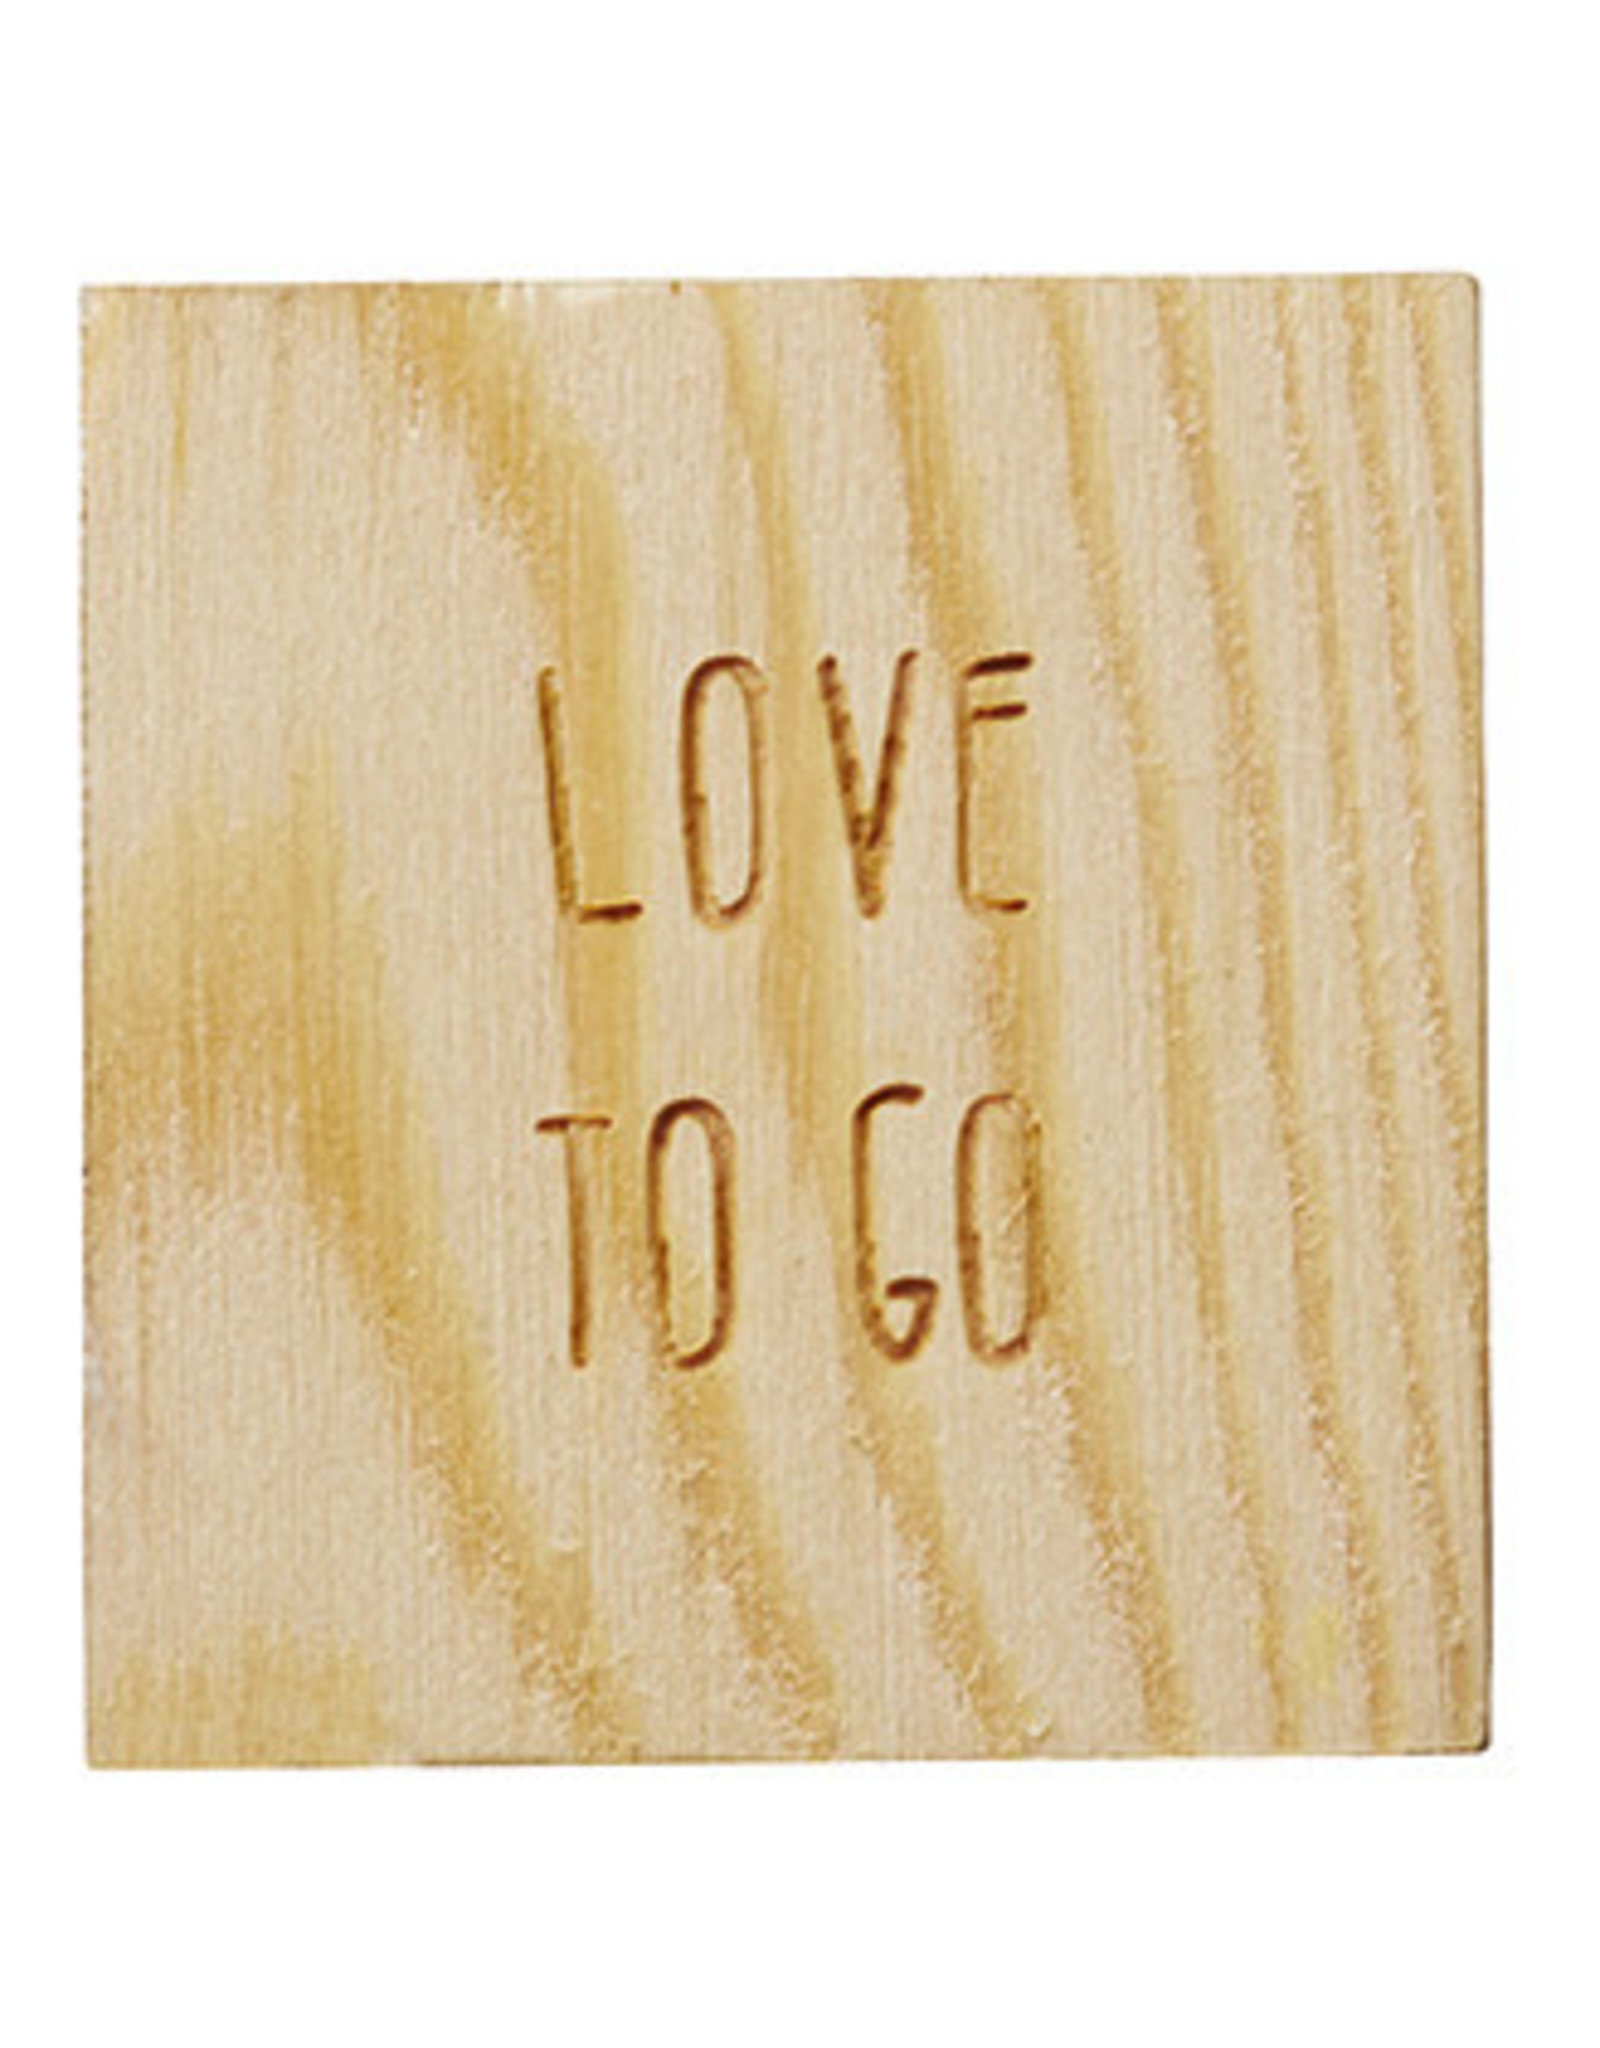 Raeder Love to go- Heart